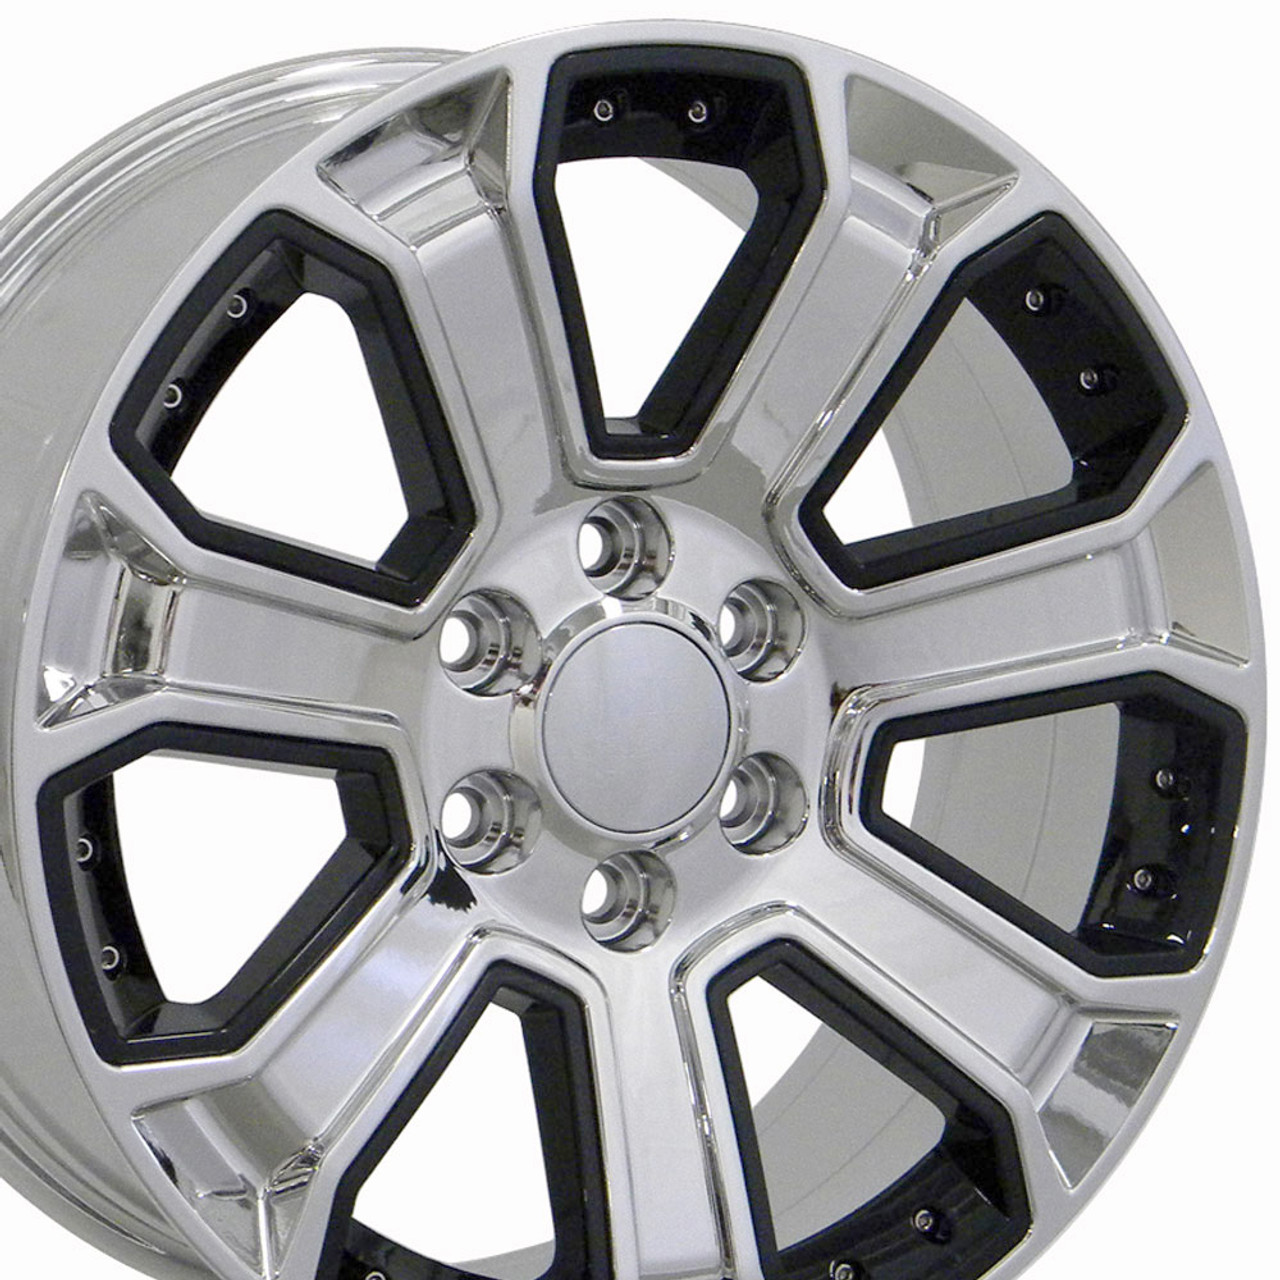 shop rims wheels sets camaro chevrolet anniversary oem chevy tires